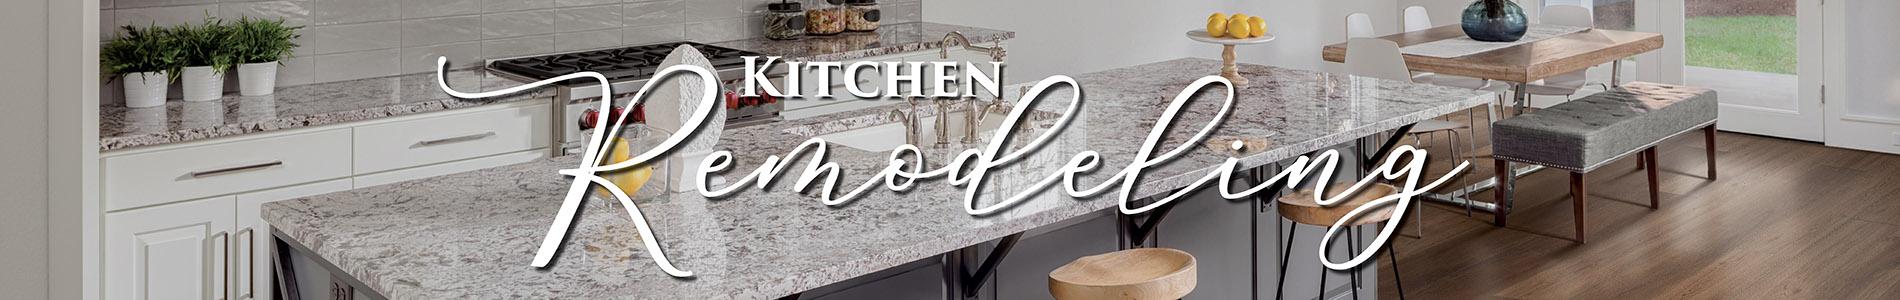 Kitchen remodeling at Flooring USA